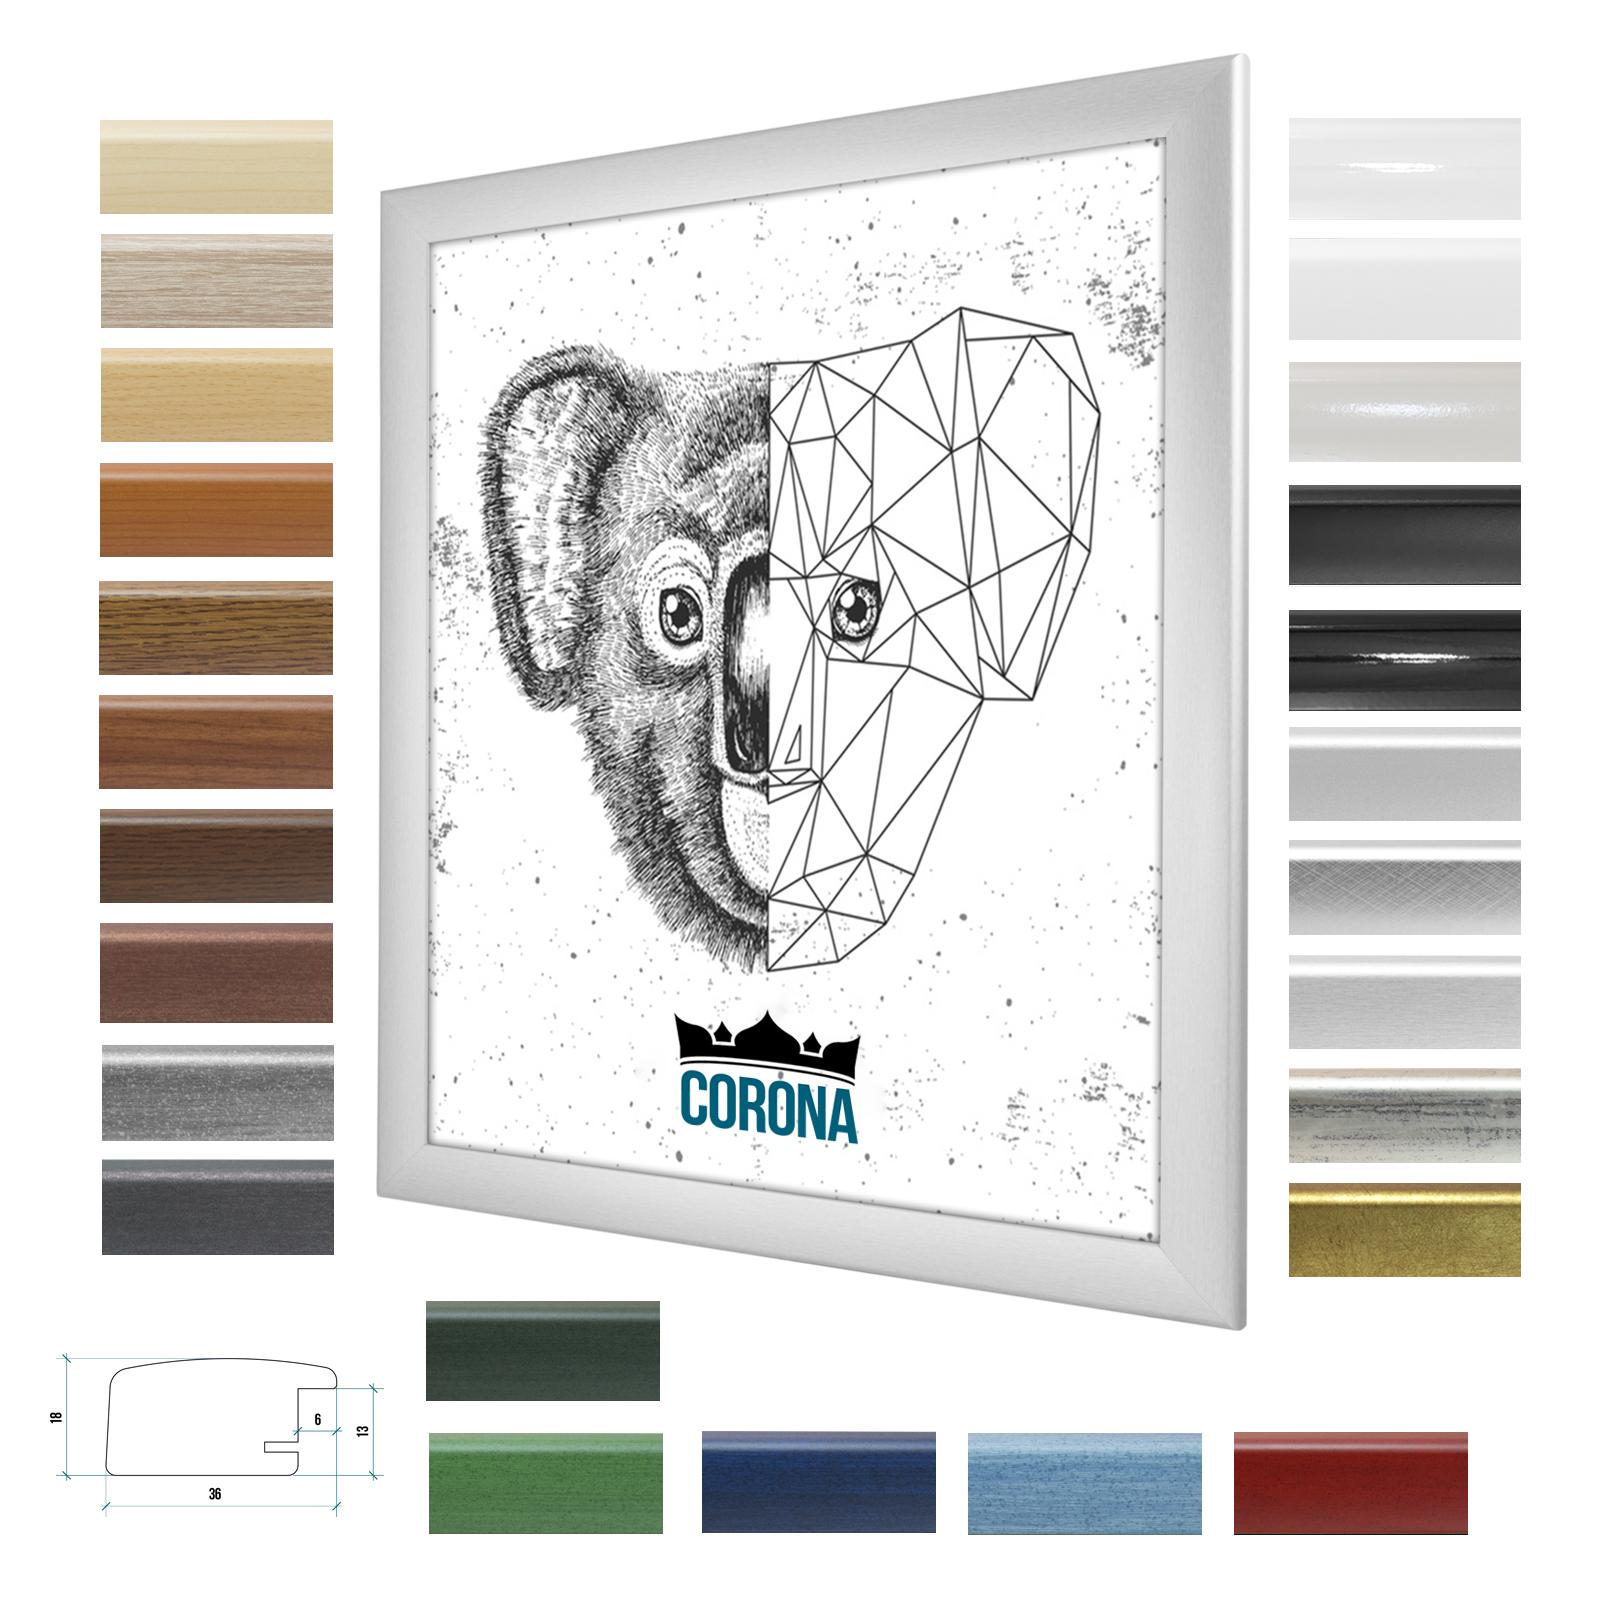 bilderrahmen corona in 25 farben 40x50 50x40 modern wechselrahmen neu poster ebay. Black Bedroom Furniture Sets. Home Design Ideas